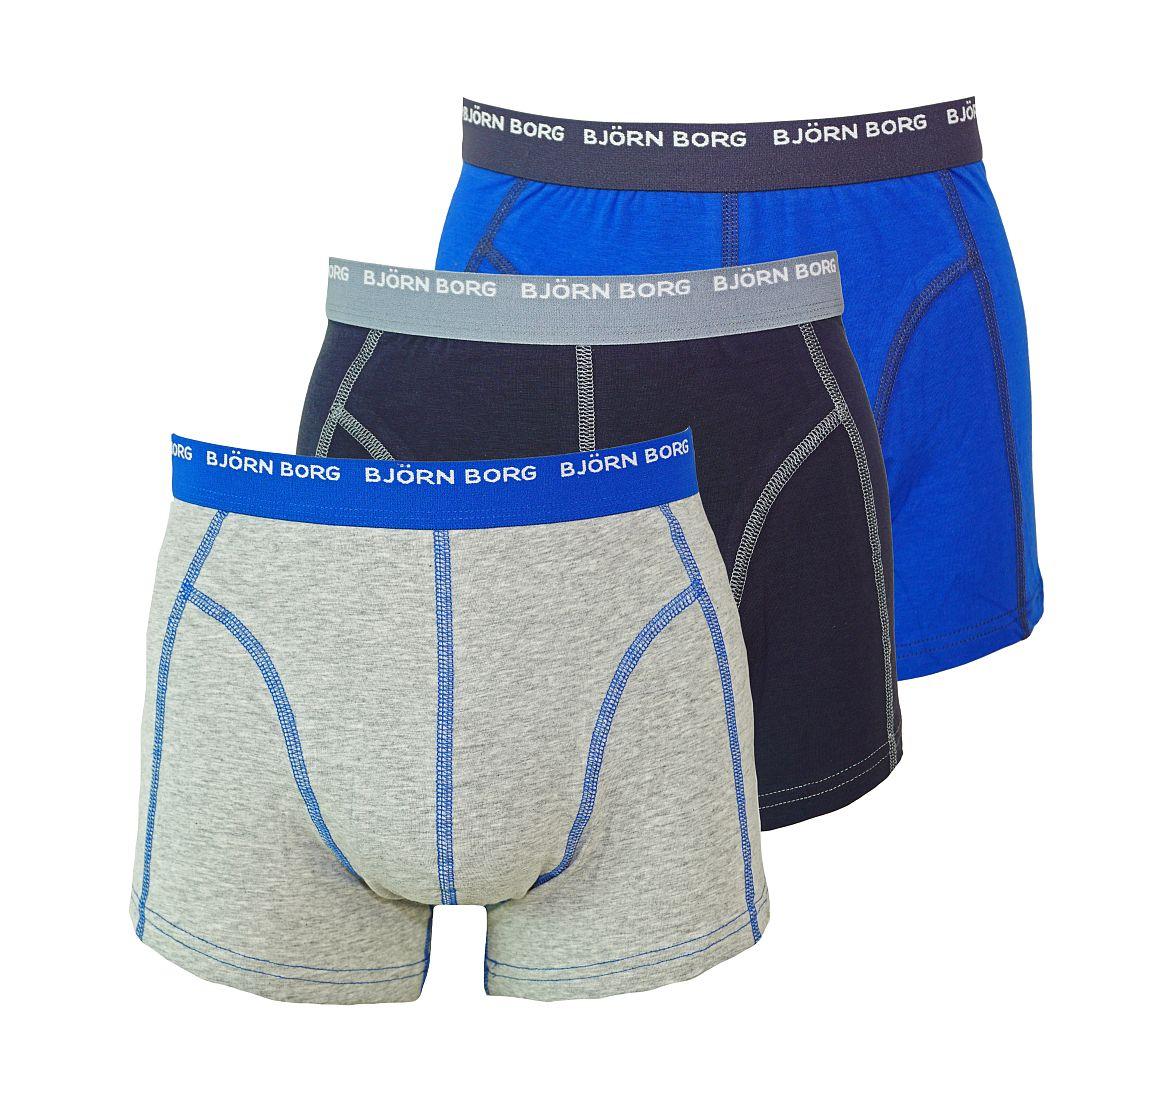 Björn Borg 3er Pack Shorts Boxershorts Unterhosen Shorts 163803 108023 90041 HW16 gp